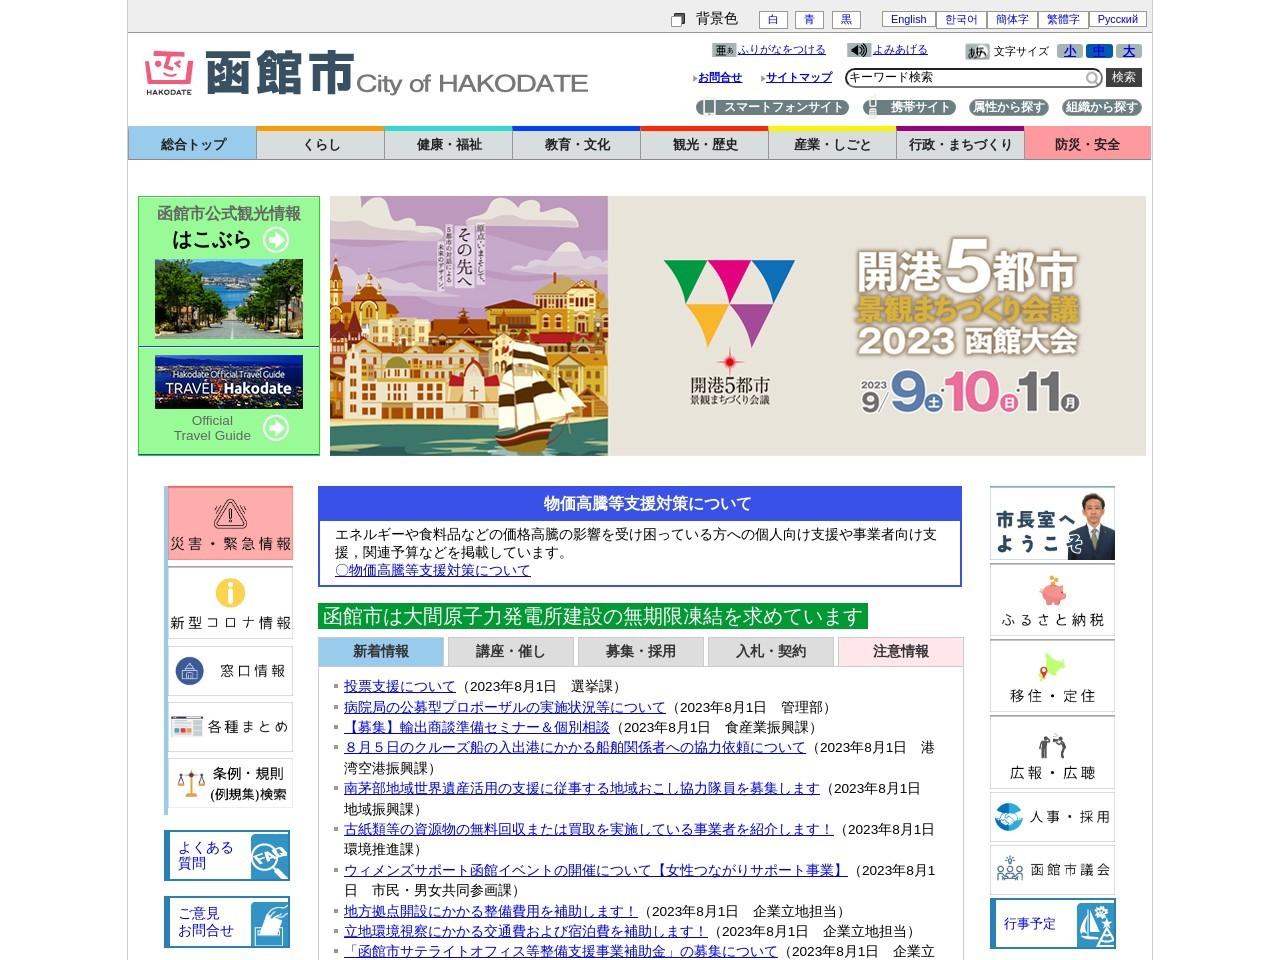 http://www.city.hakodate.hokkaido.jp/docs/2017112000017/